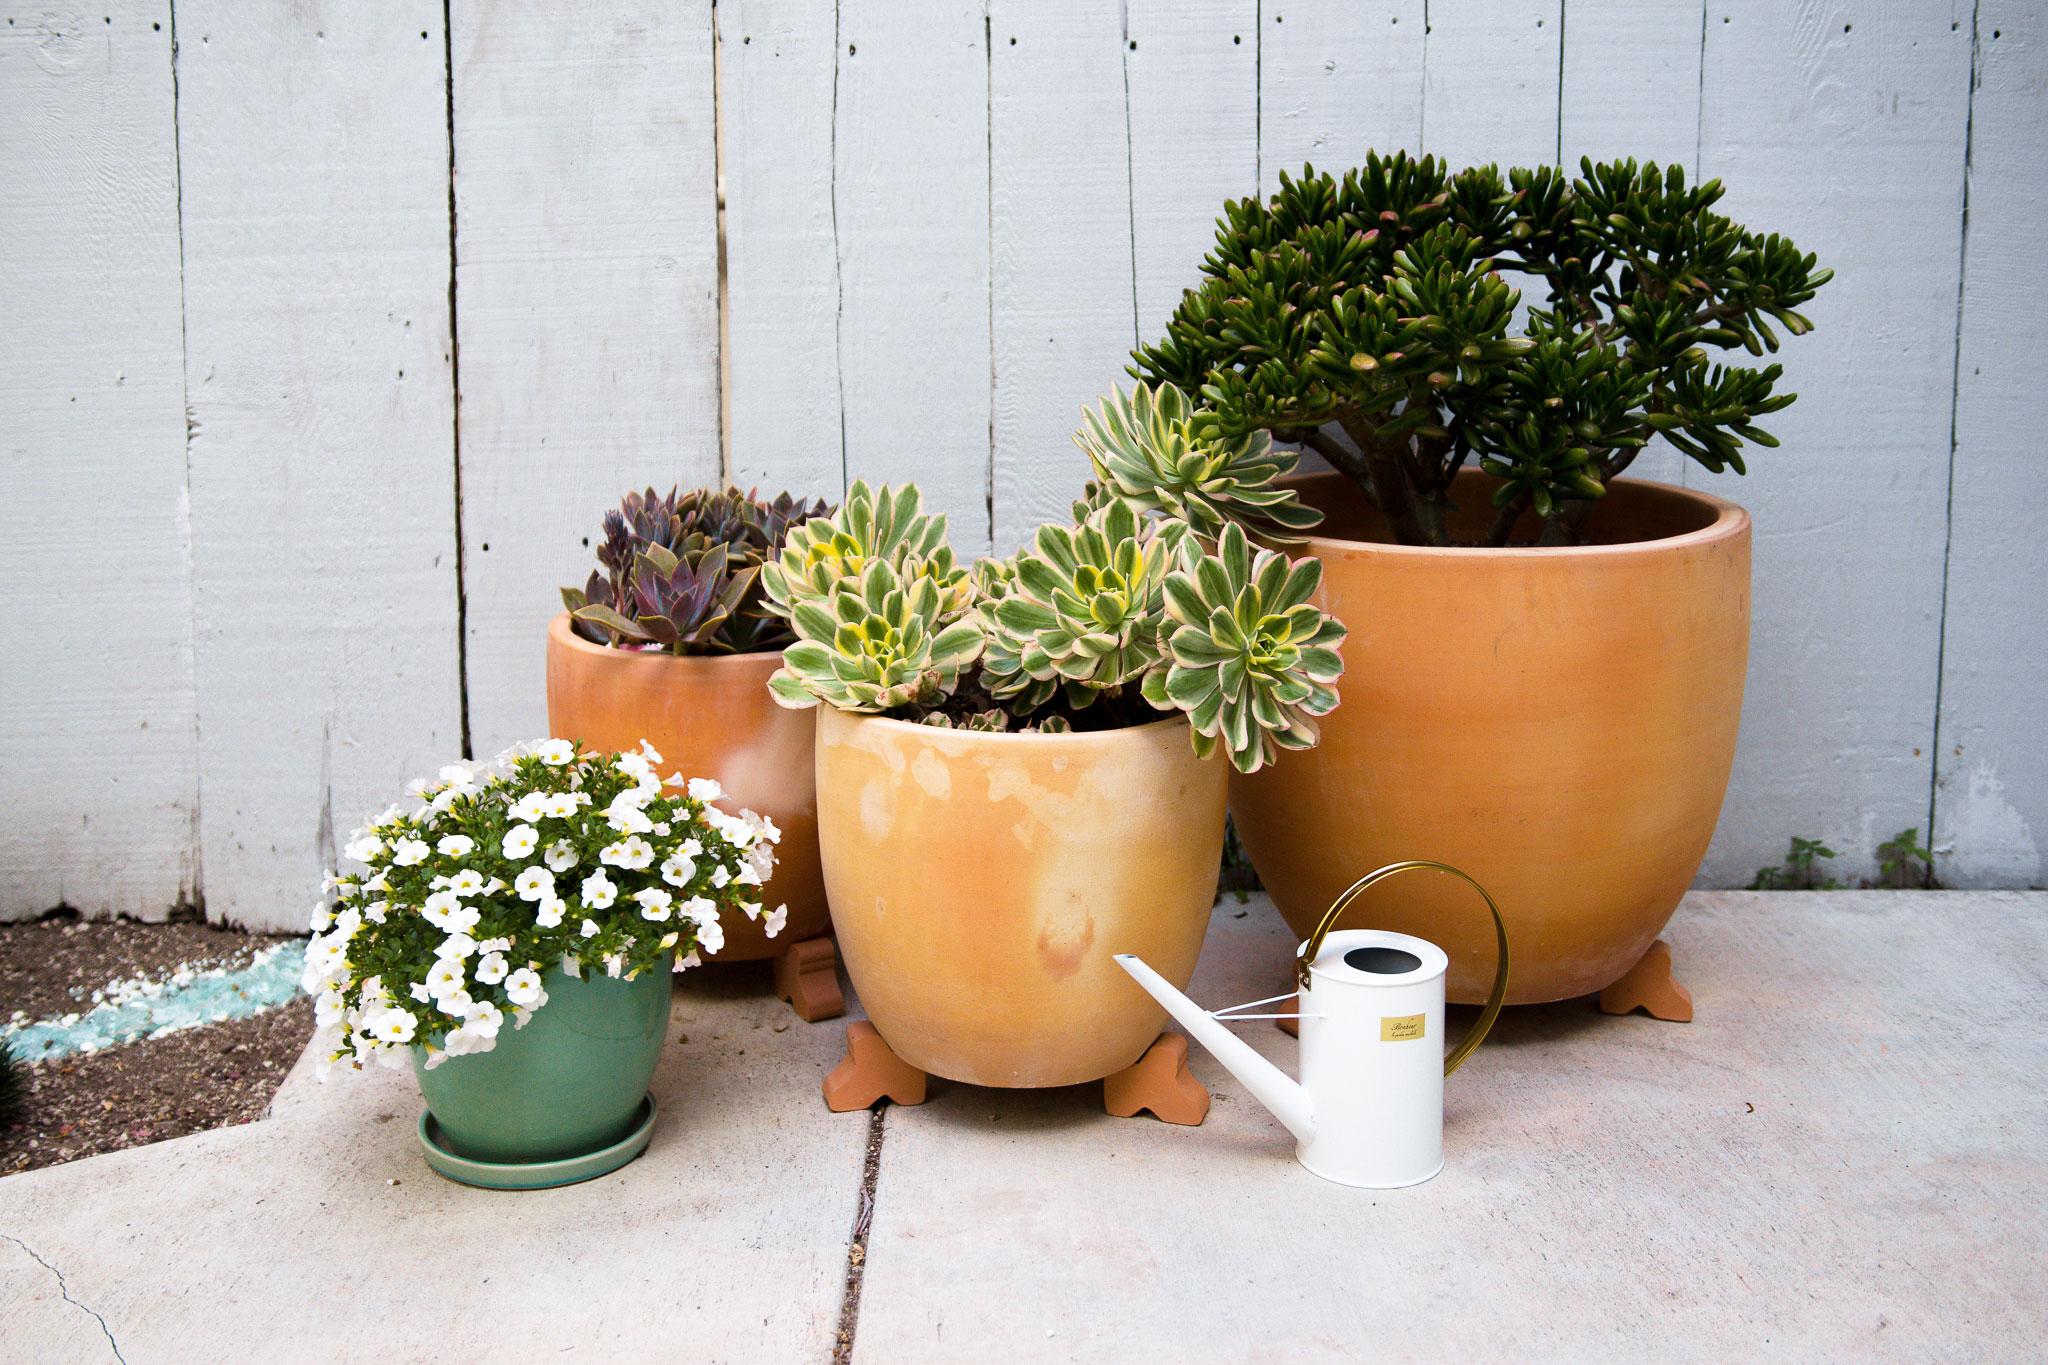 Adelya_Tumasyeva_the-garden-project_28.jpg